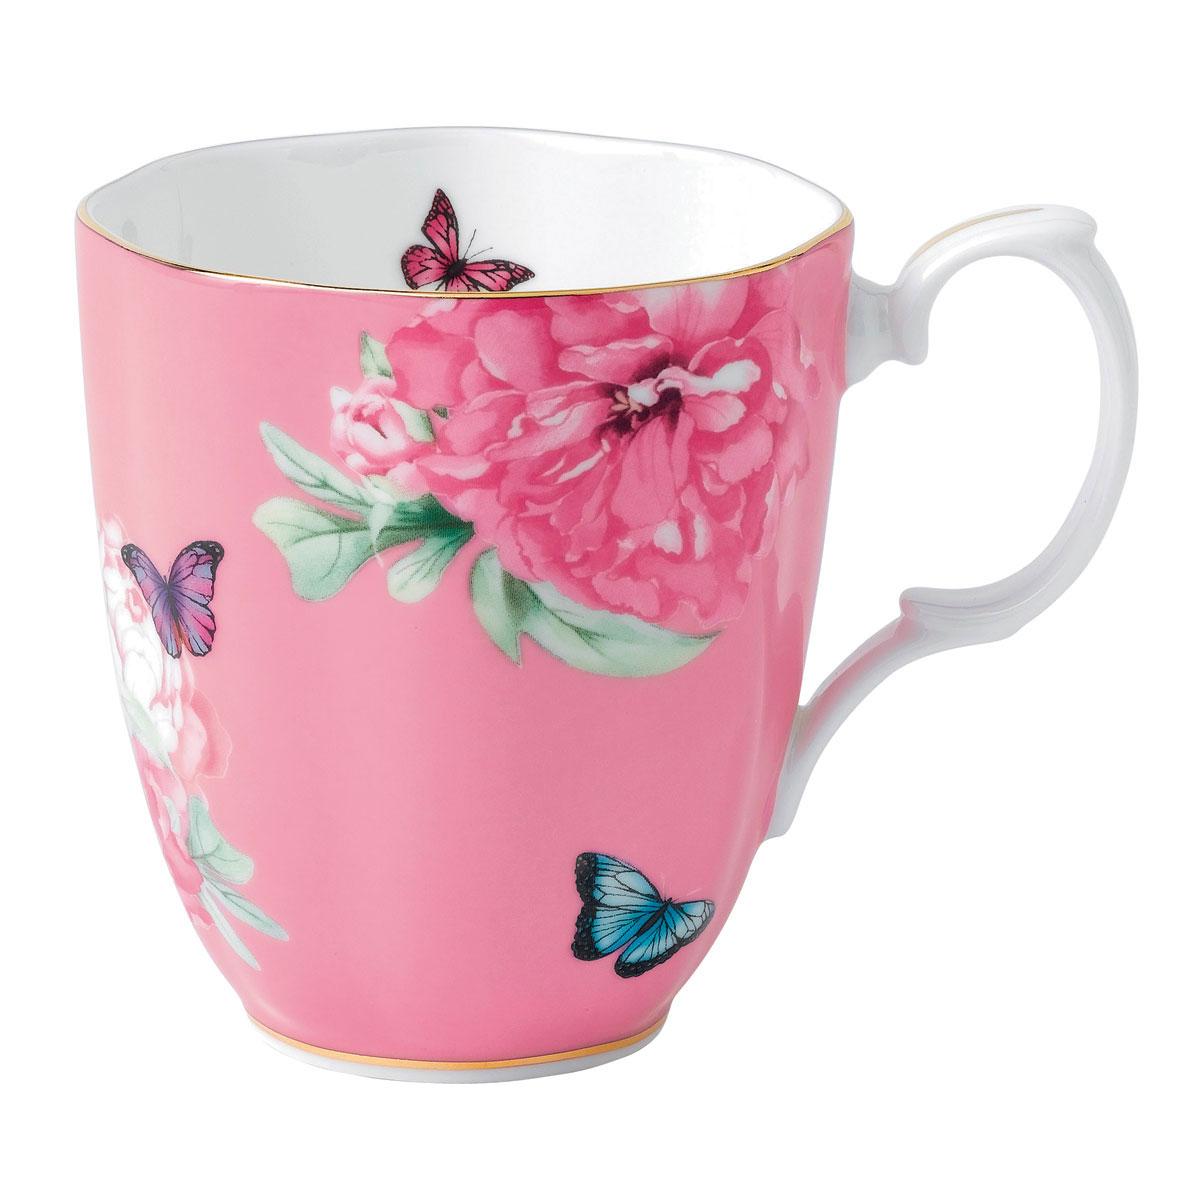 Royal Albert Friendship Vintage Mug 13.5 Oz Pink